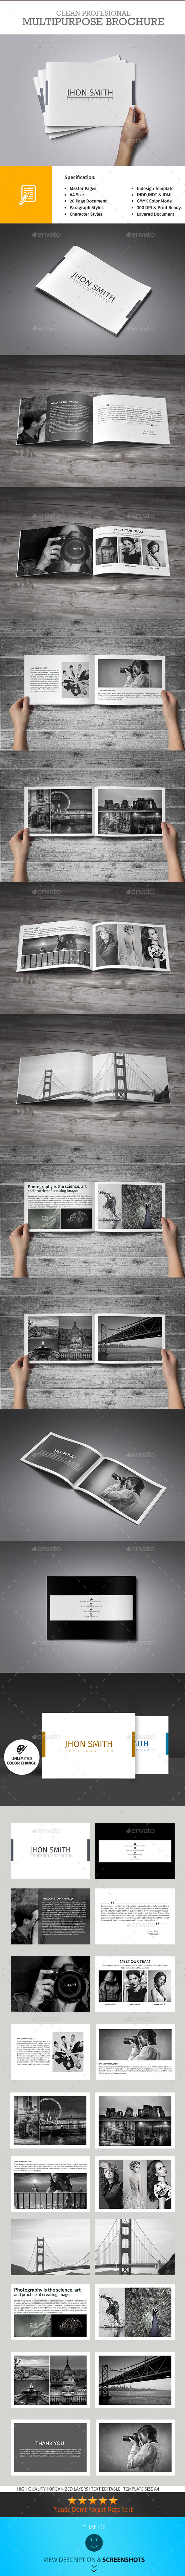 GraphicRiver Minimal Portfolio Brochure 10485718